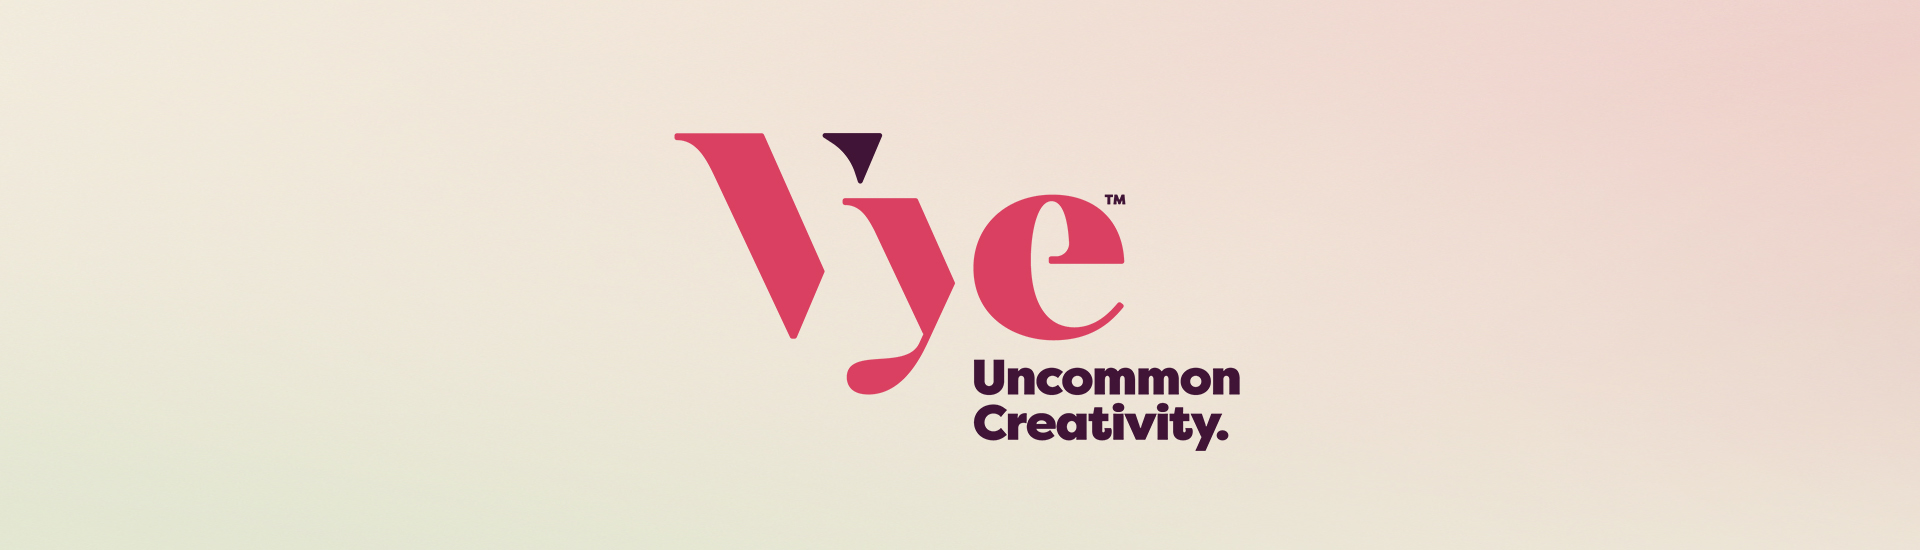 Vye-Blog-_0039_Leighton Interactive Repositions, Changes Name, To Vye-1